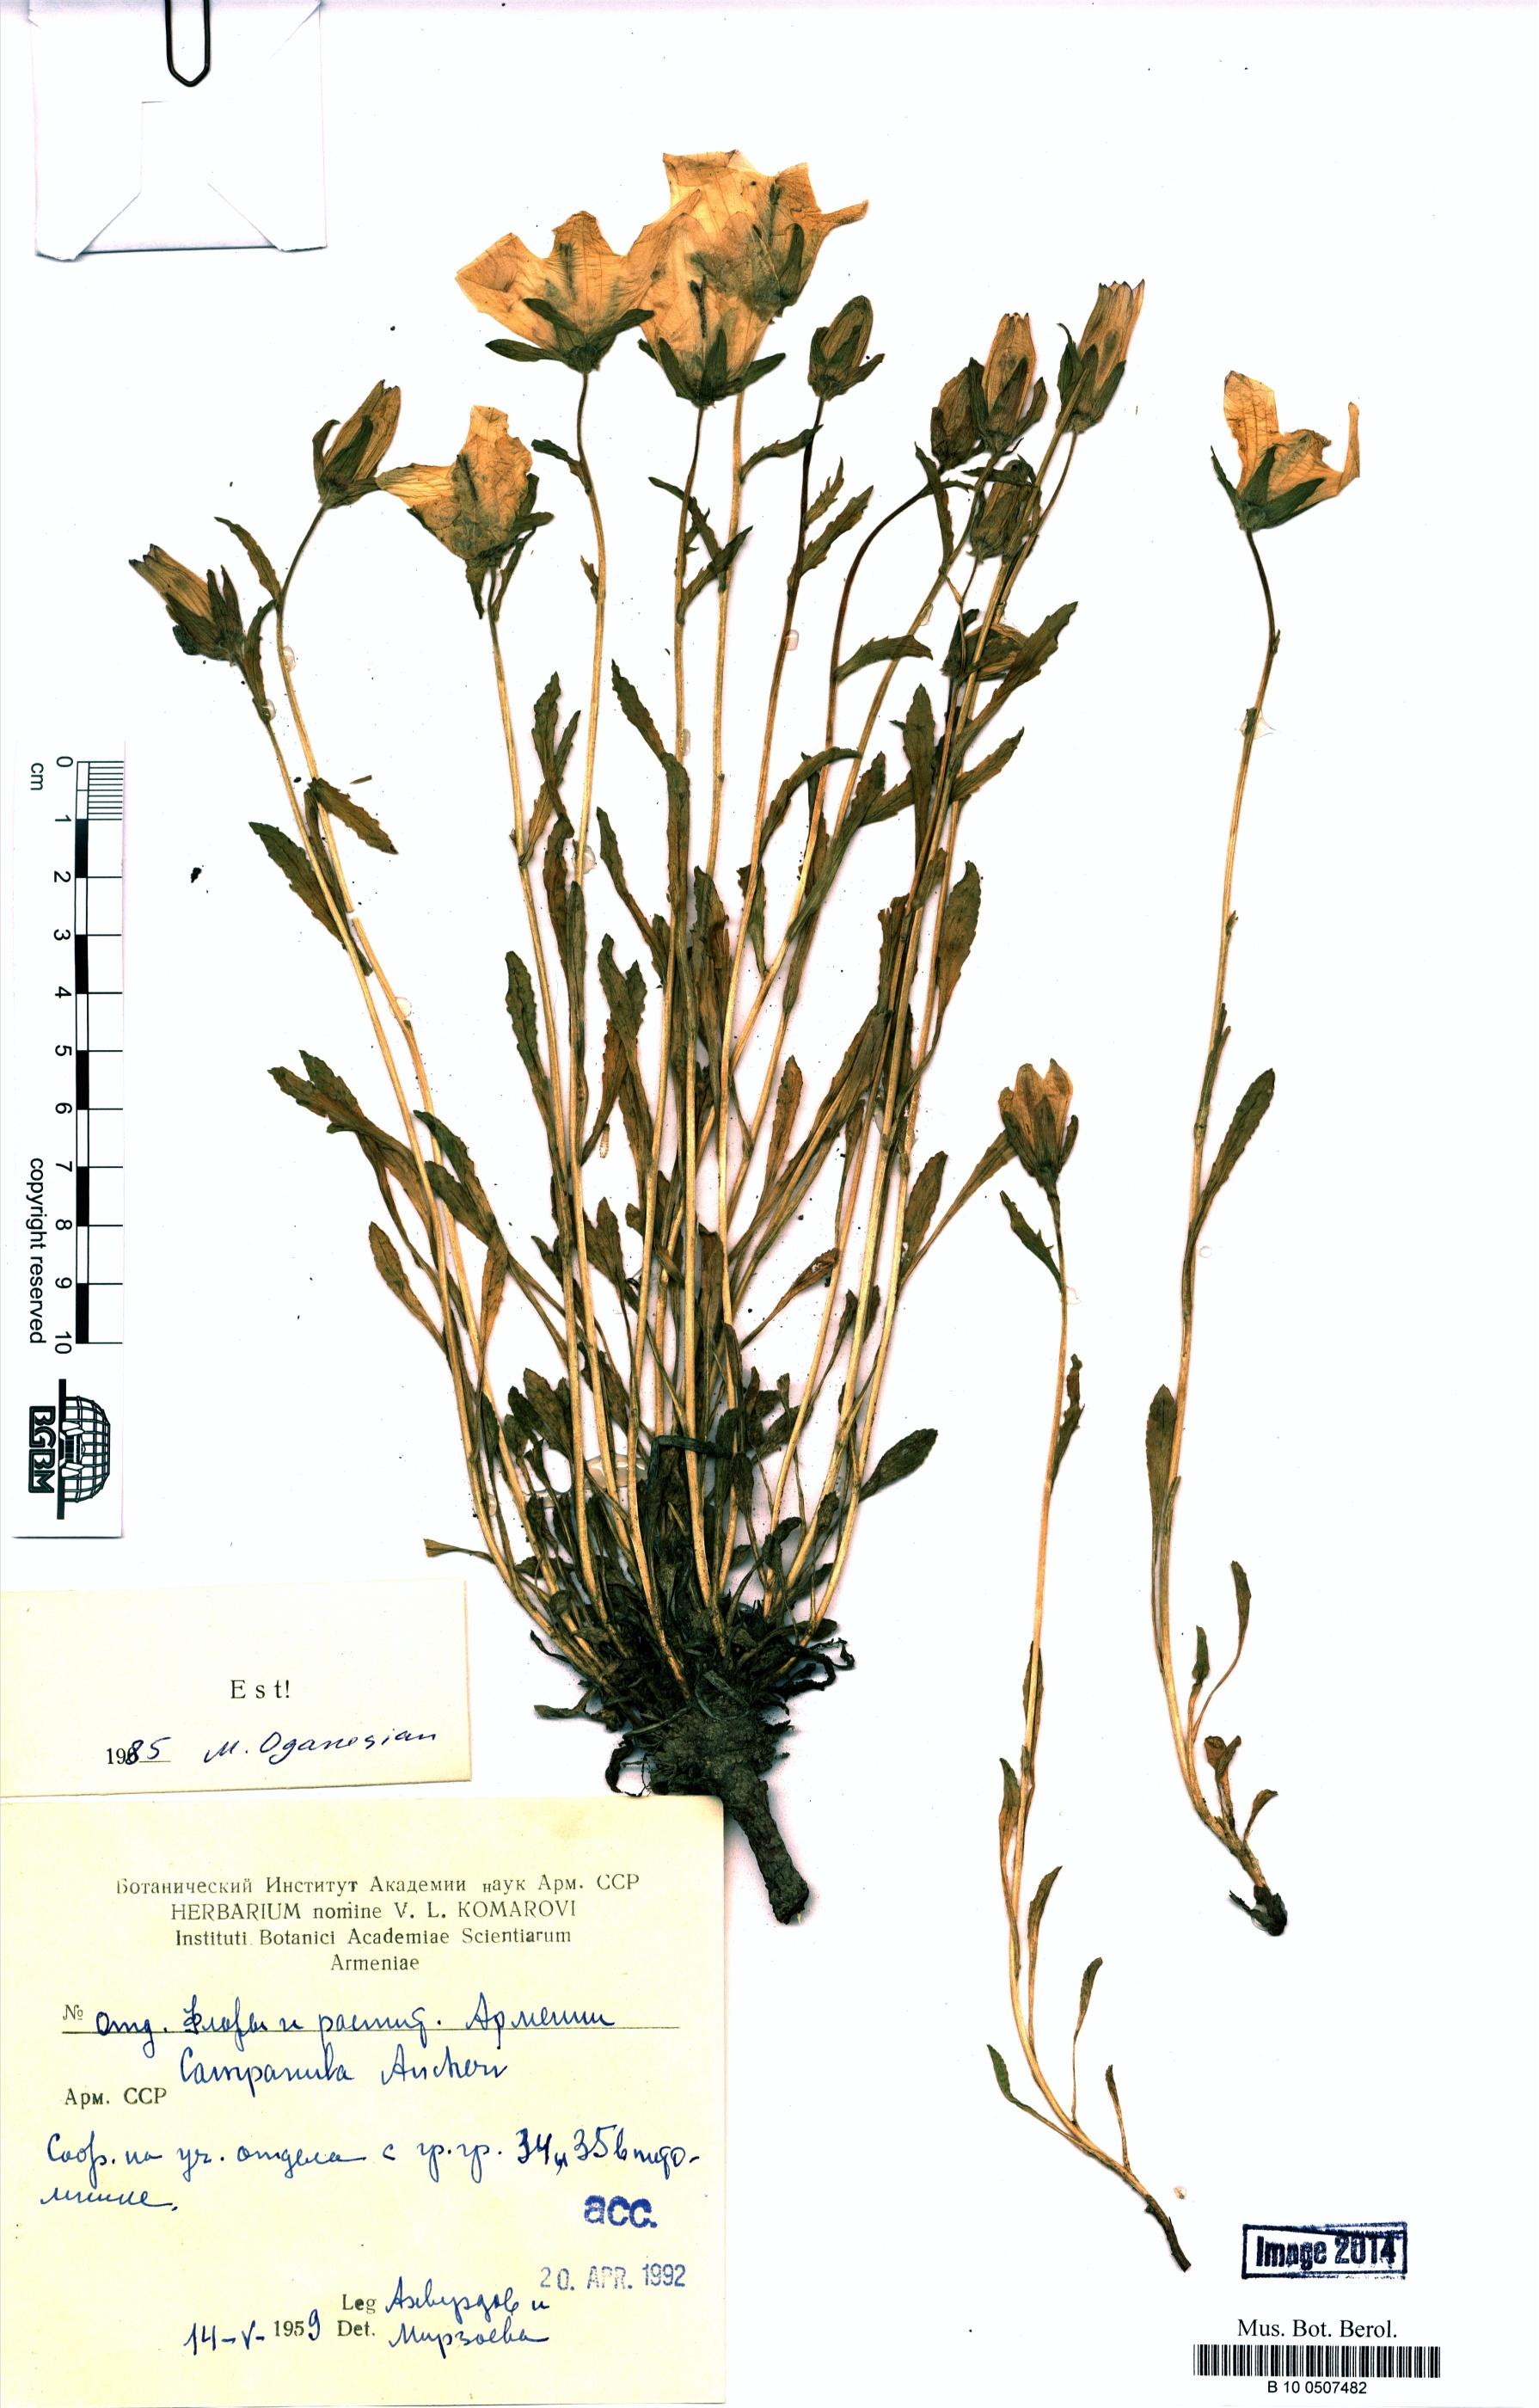 http://ww2.bgbm.org/herbarium/images/B/10/05/07/48/B_10_0507482.jpg